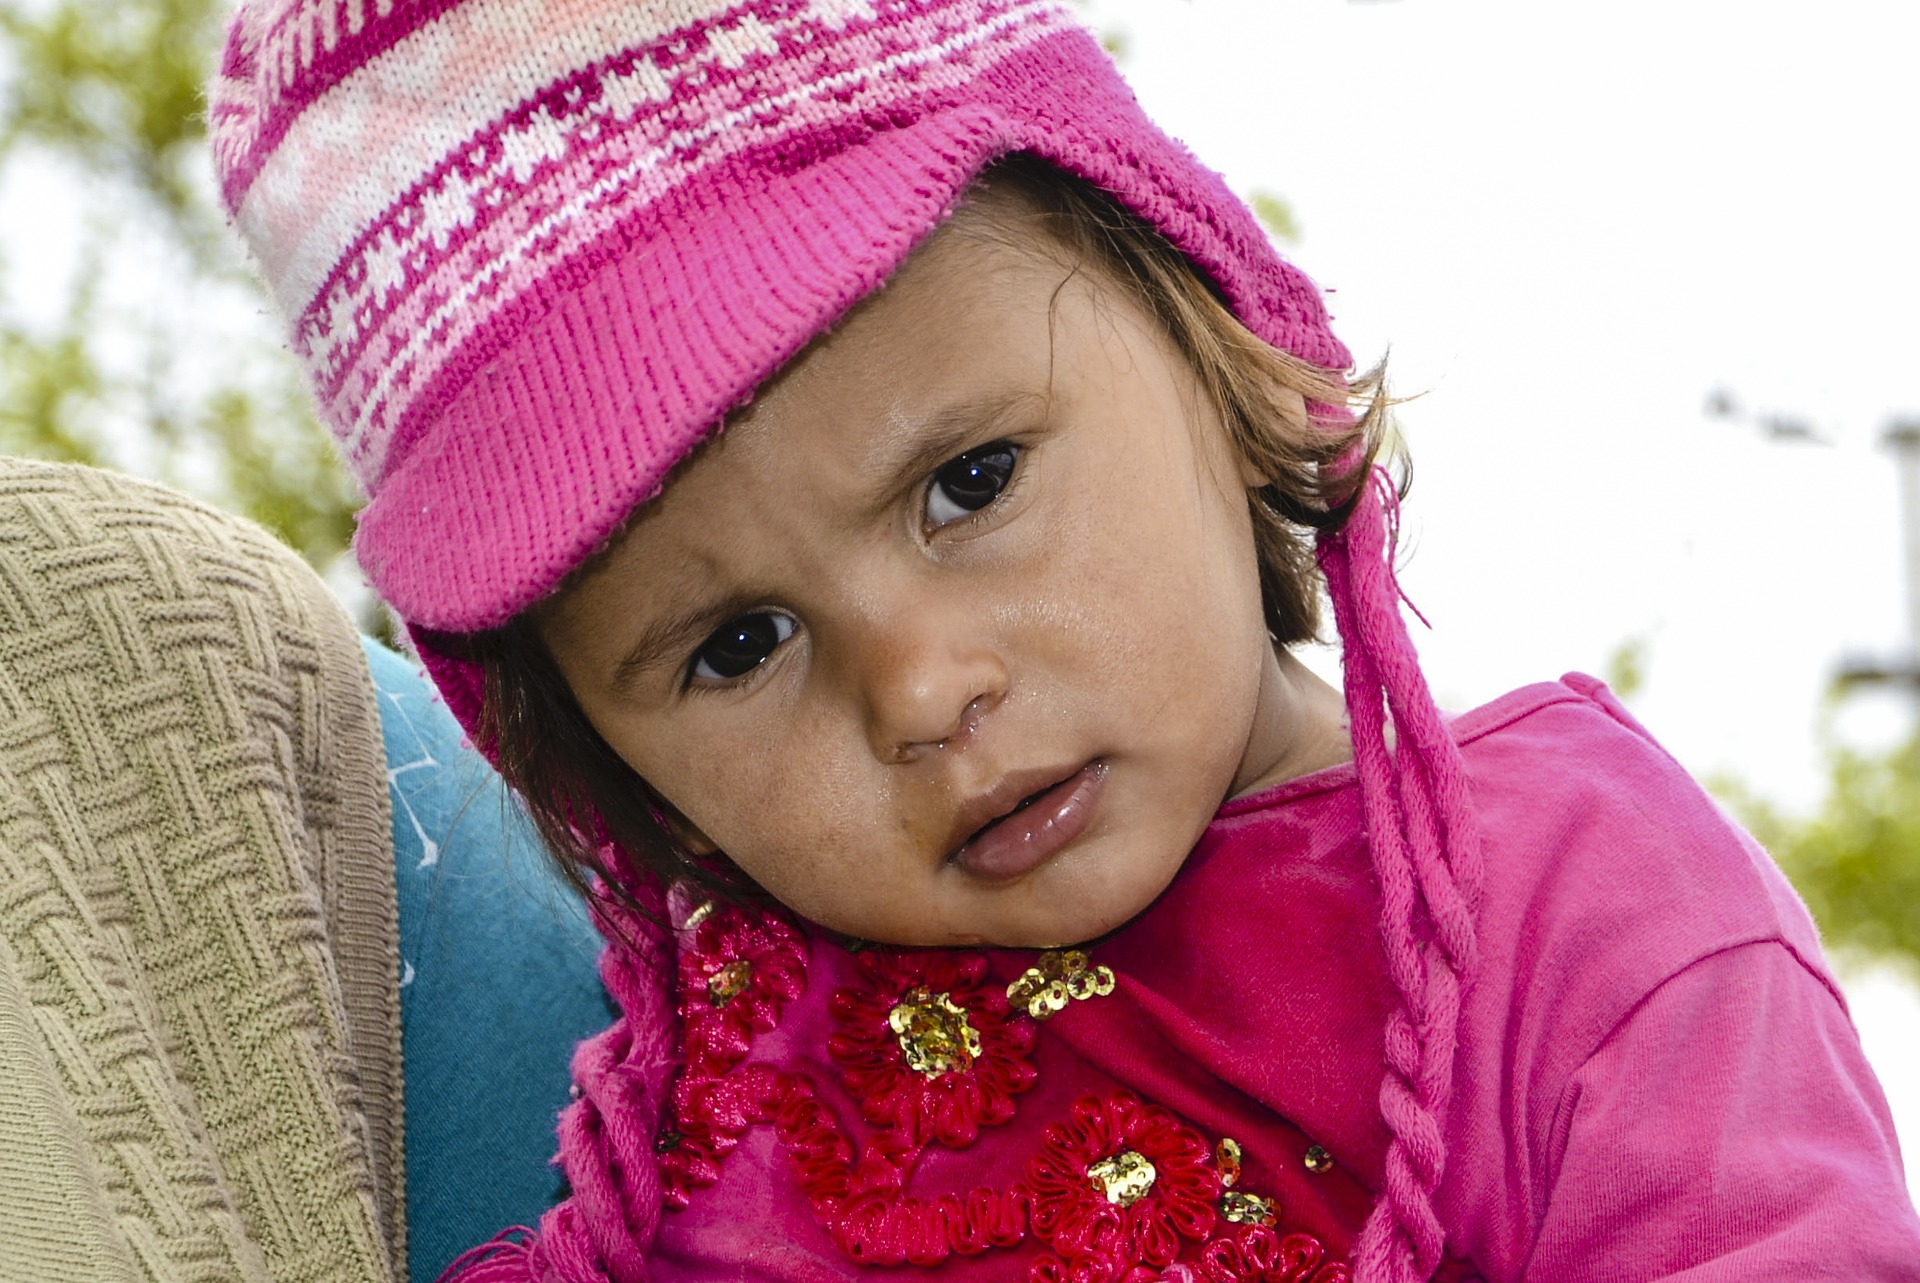 baby-1697966_1920.jpg